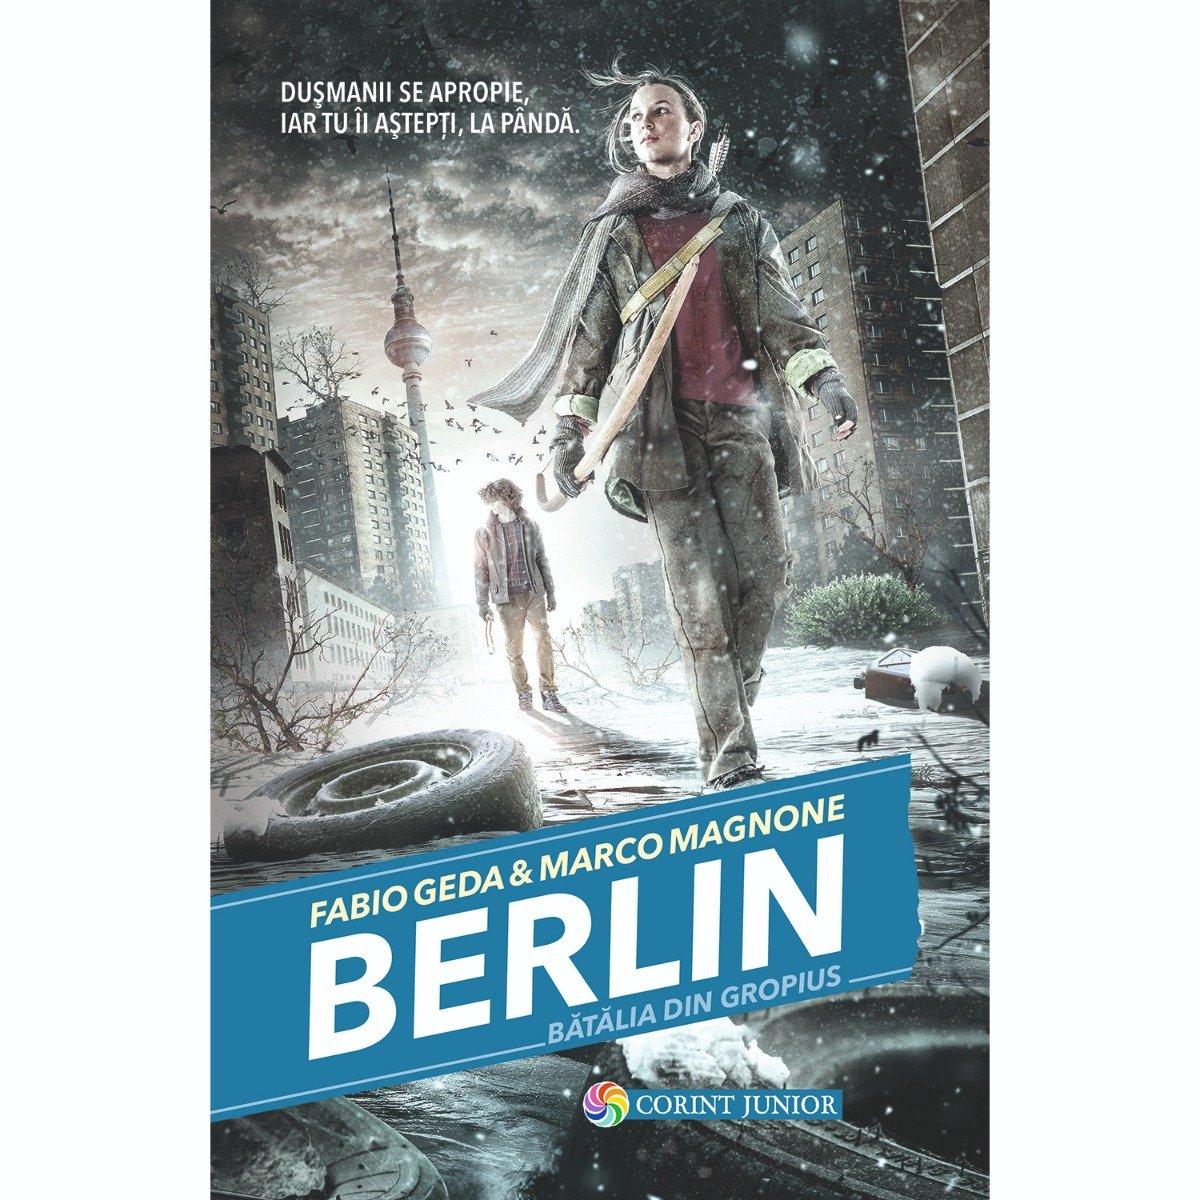 Carte Editura Corint, Berlin vol.III Batalia din Gropius, Fabio Geda, Marco Magnone